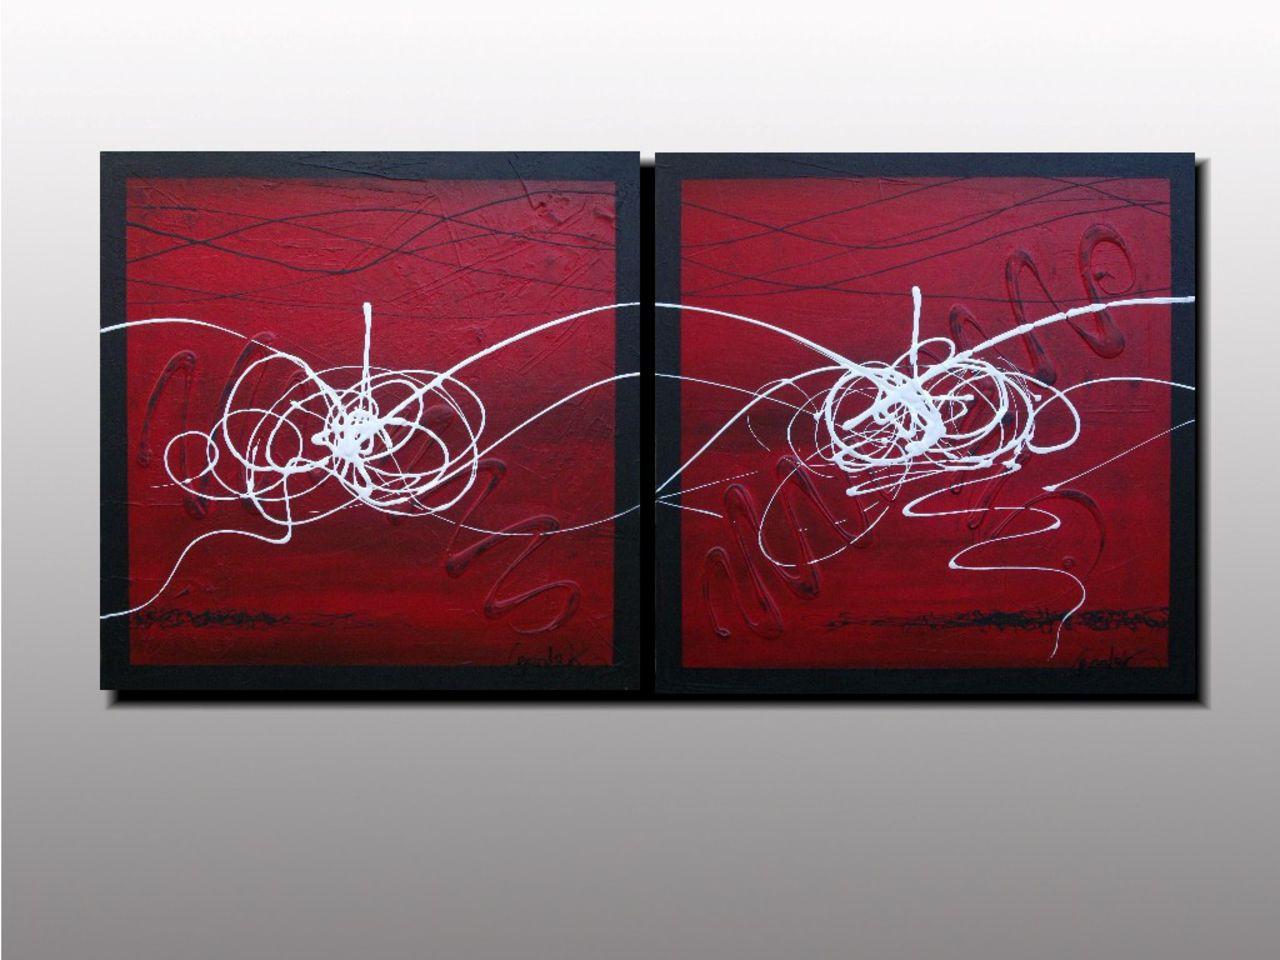 MISTER K  (Lepolsk Matuszewski) ENTITE 1 et 2 Lepolsk Matuszewski 2011